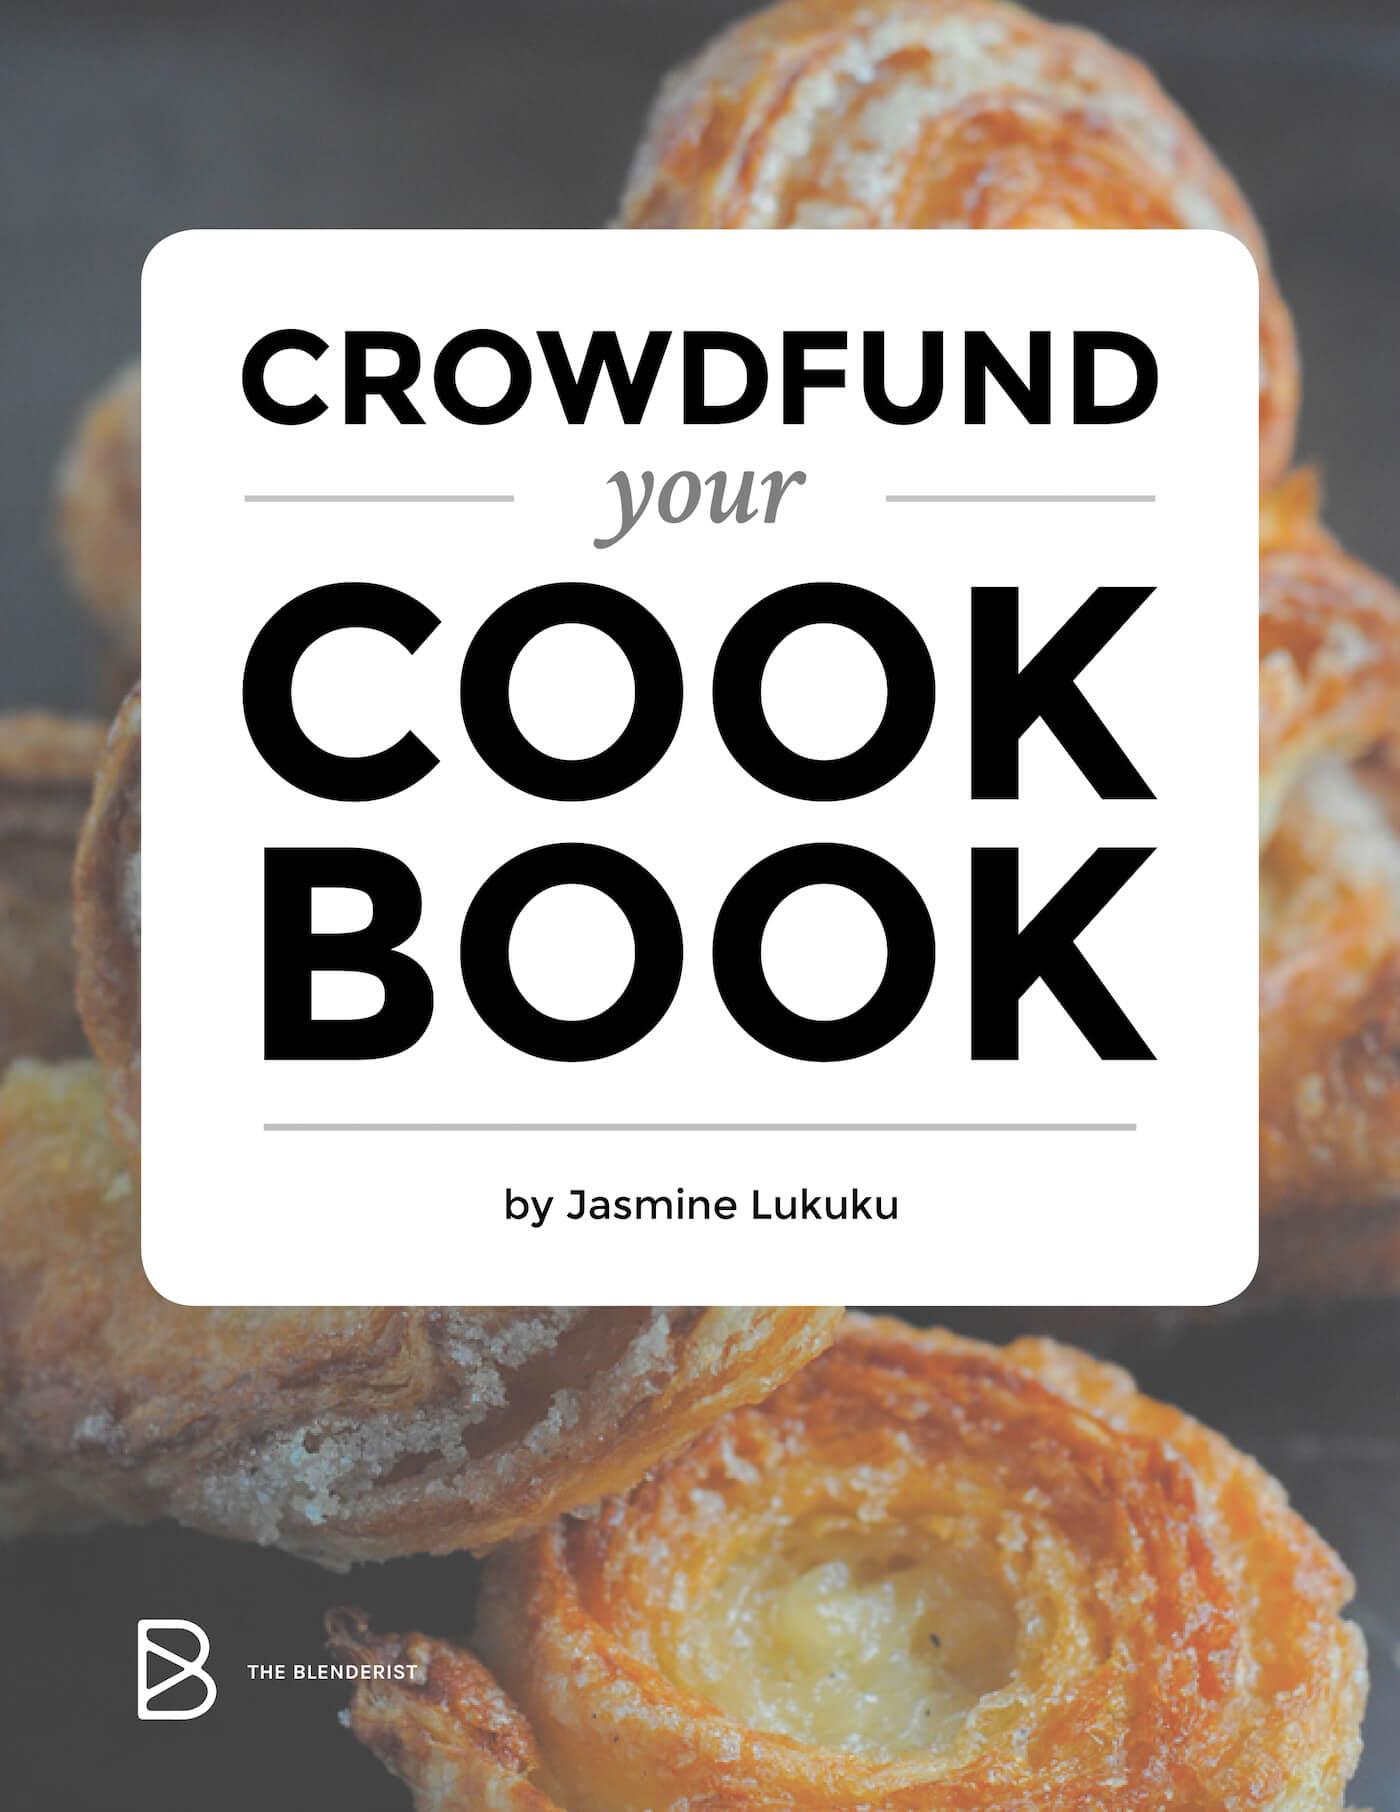 Crowdfunding-a-cookbook-self-publishing